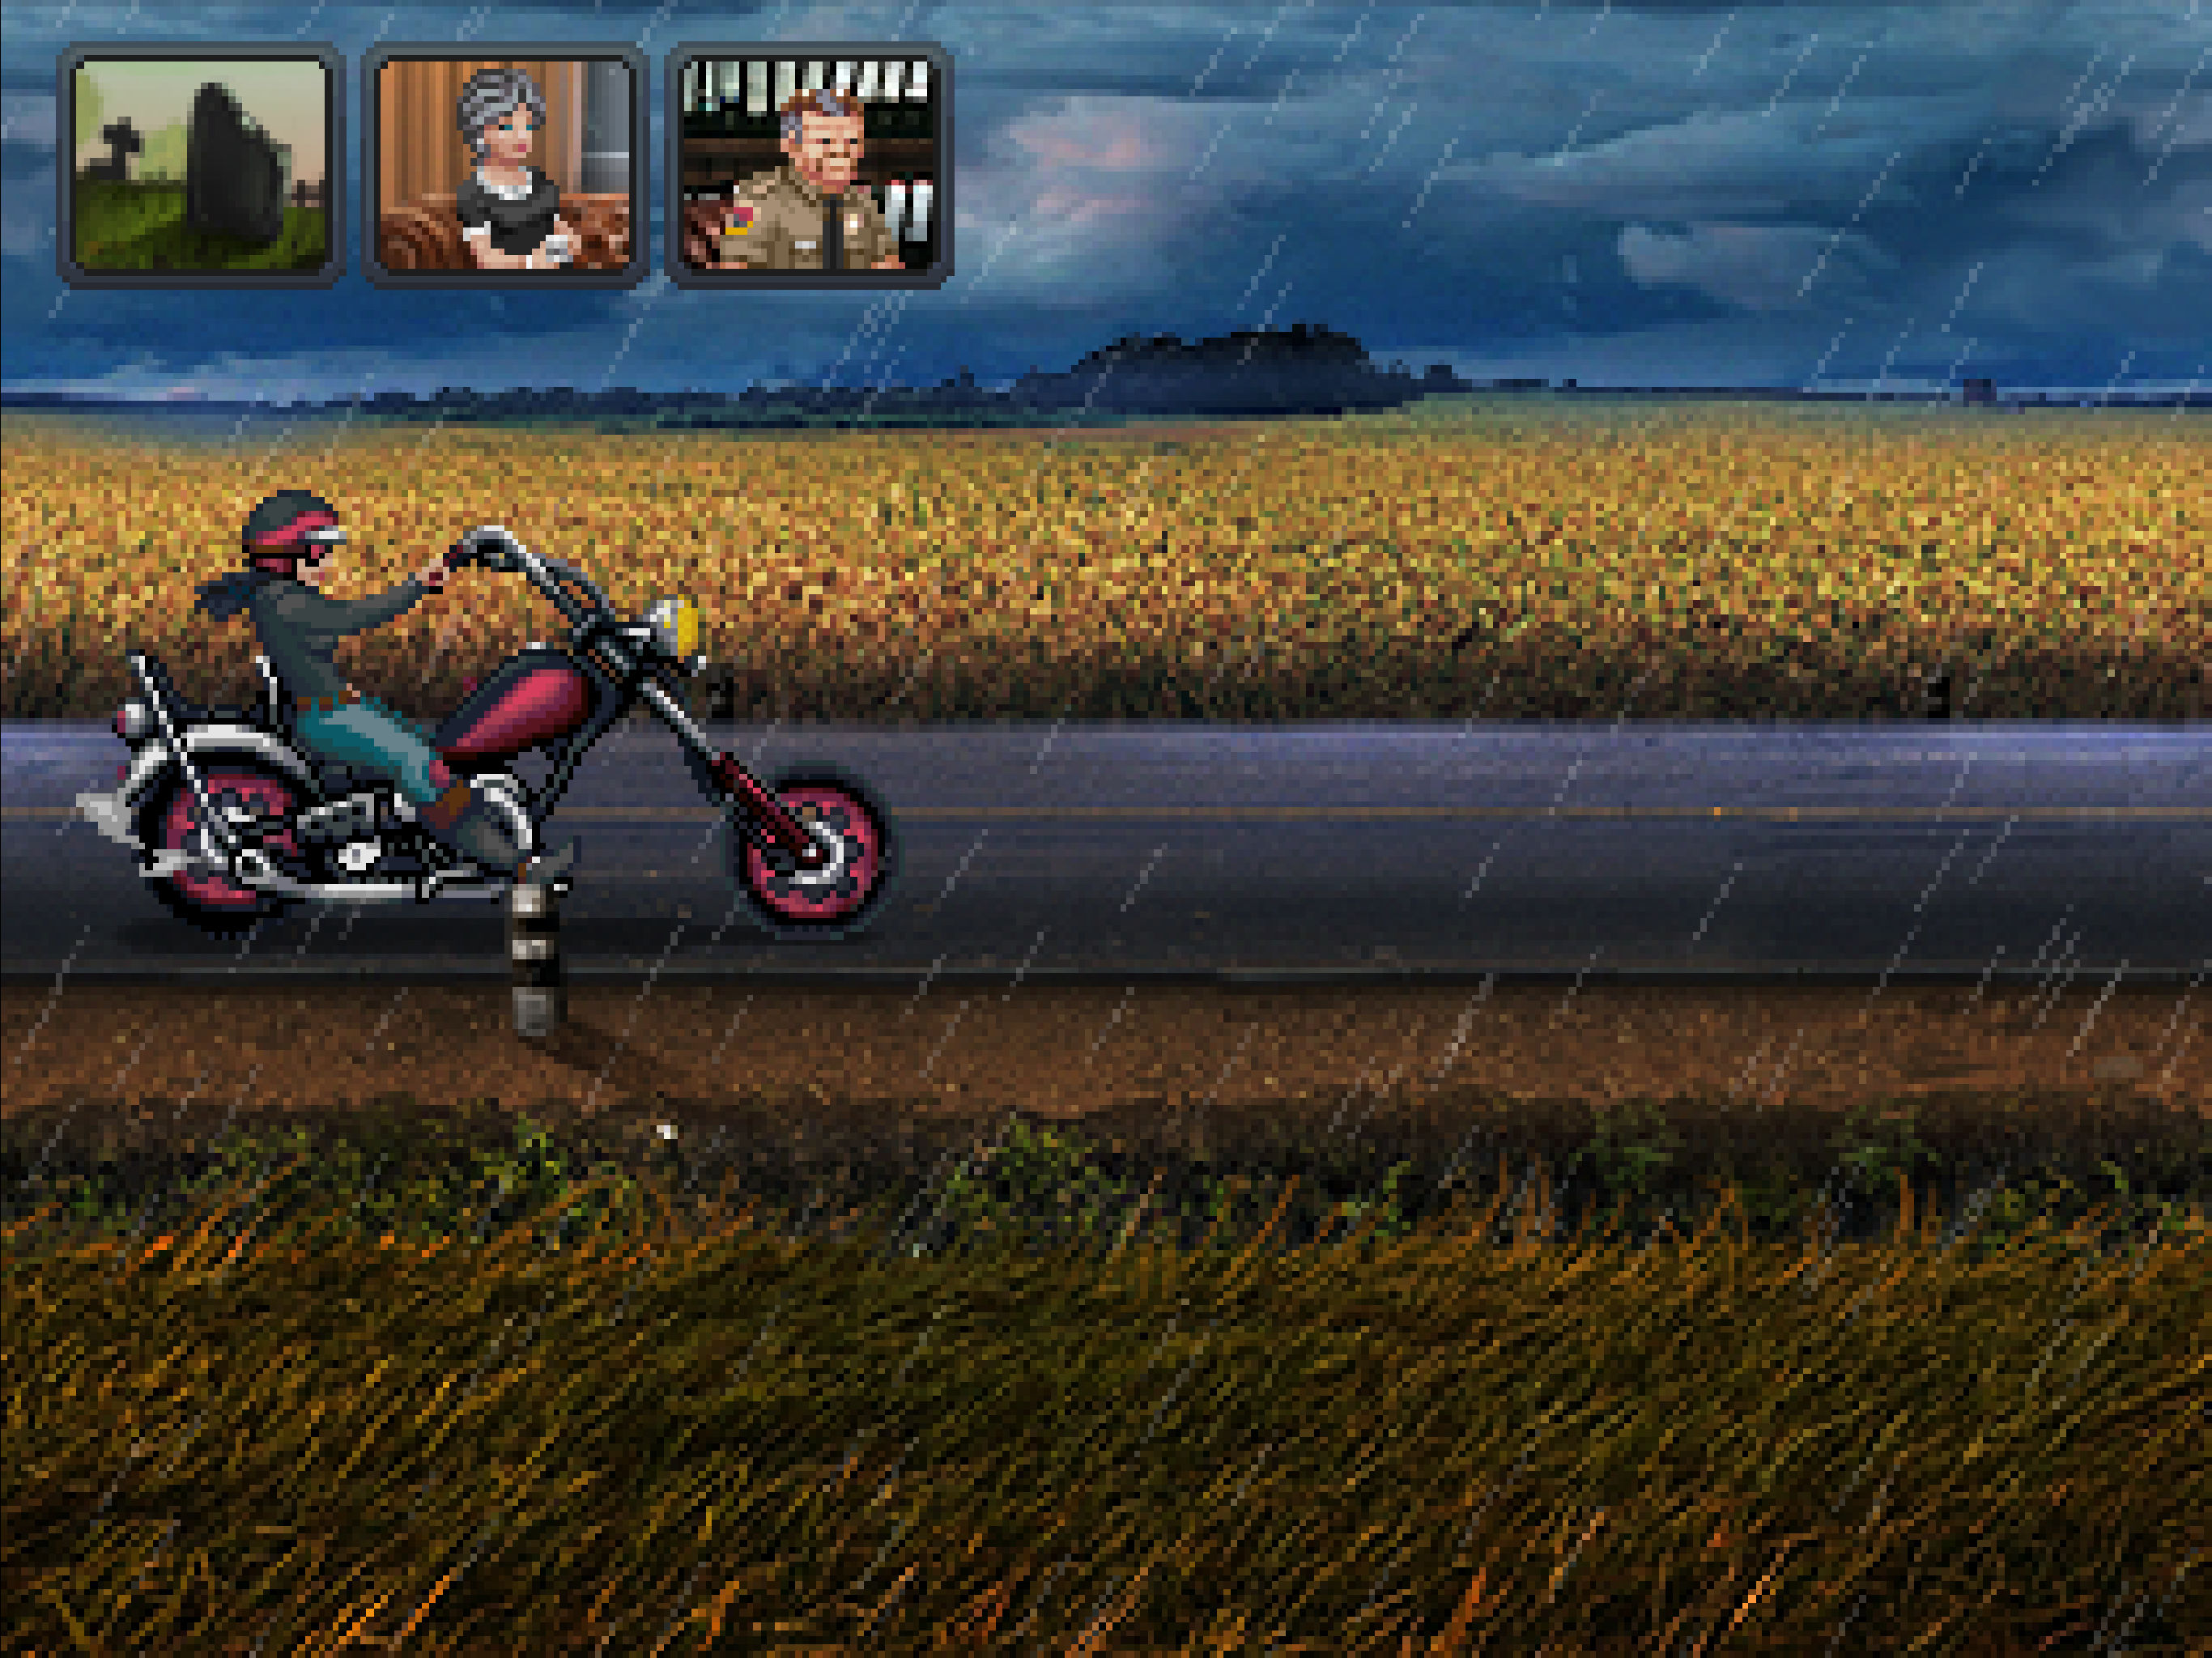 kathy-rain-motorcycle